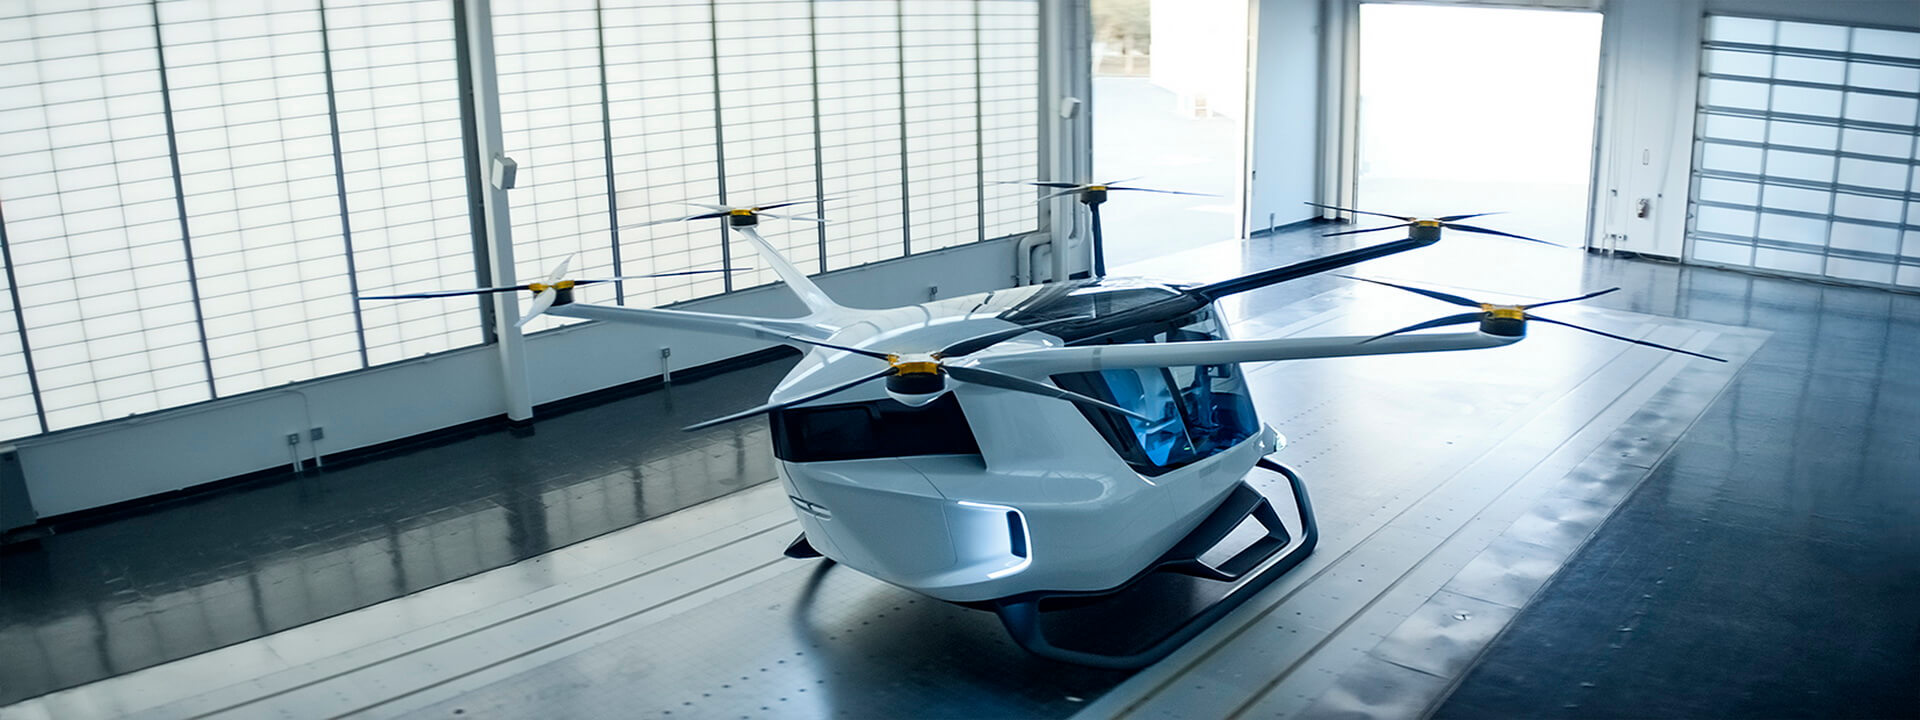 Alaka'i Technologies представили Skai – первое летающее такси на водороде